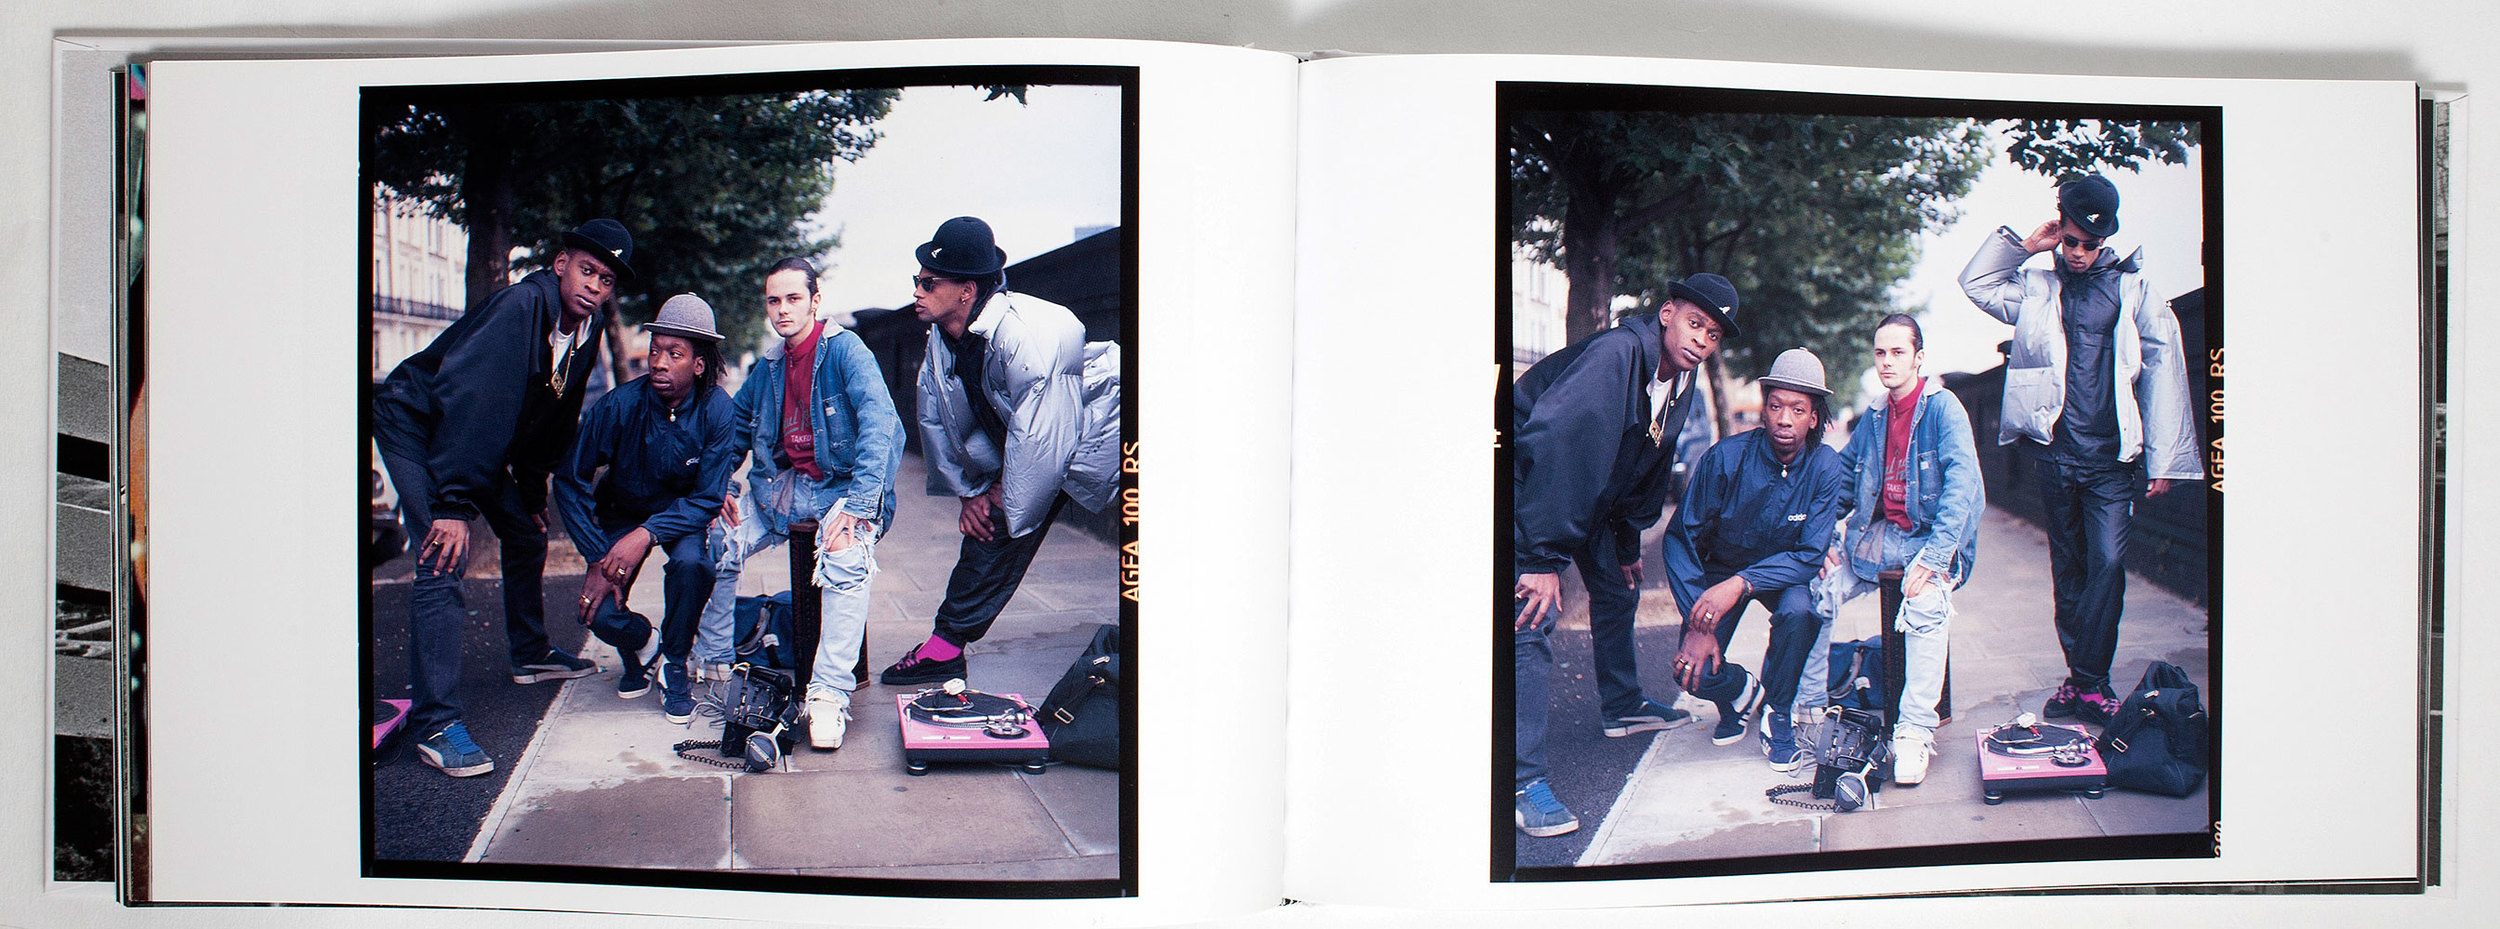 epm-print-management-bristol-photography-books-4.jpg